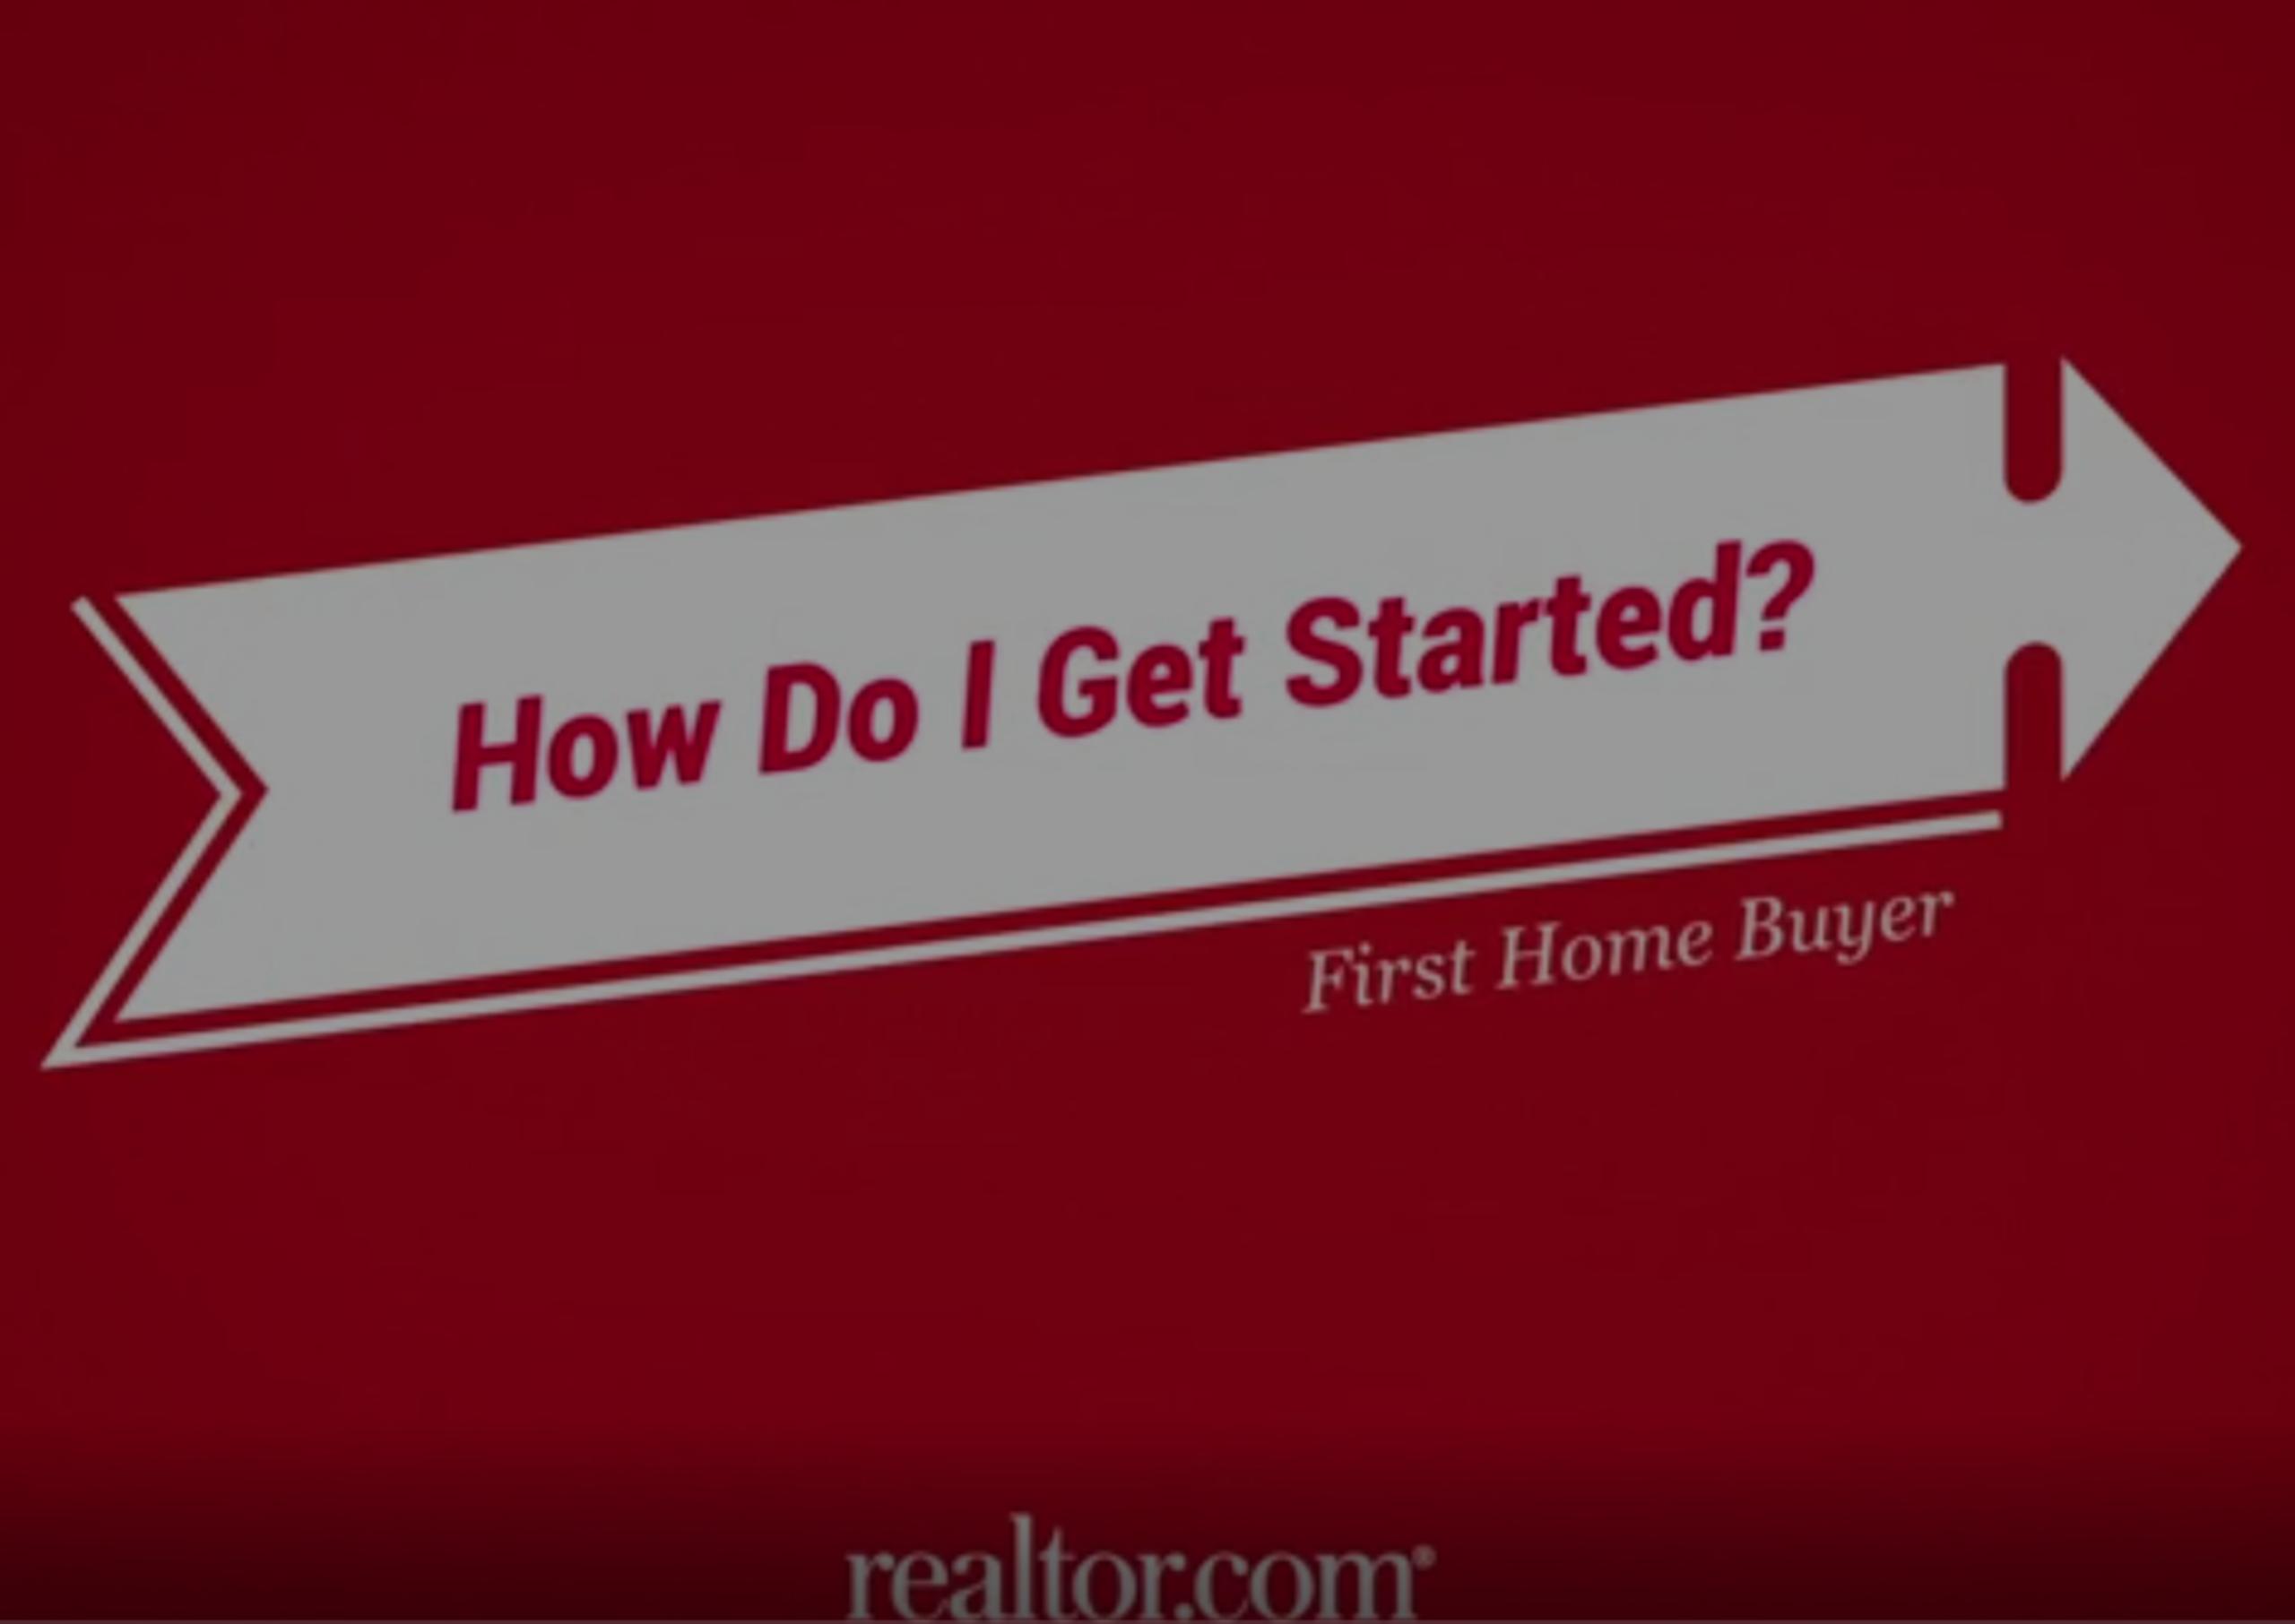 Step 1: How do I get started?